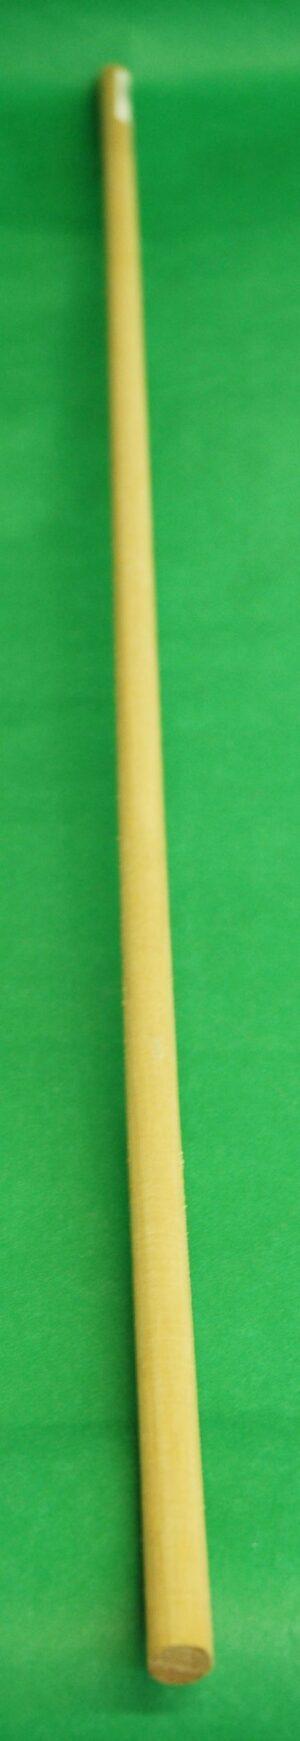 p 3992 DOWEL